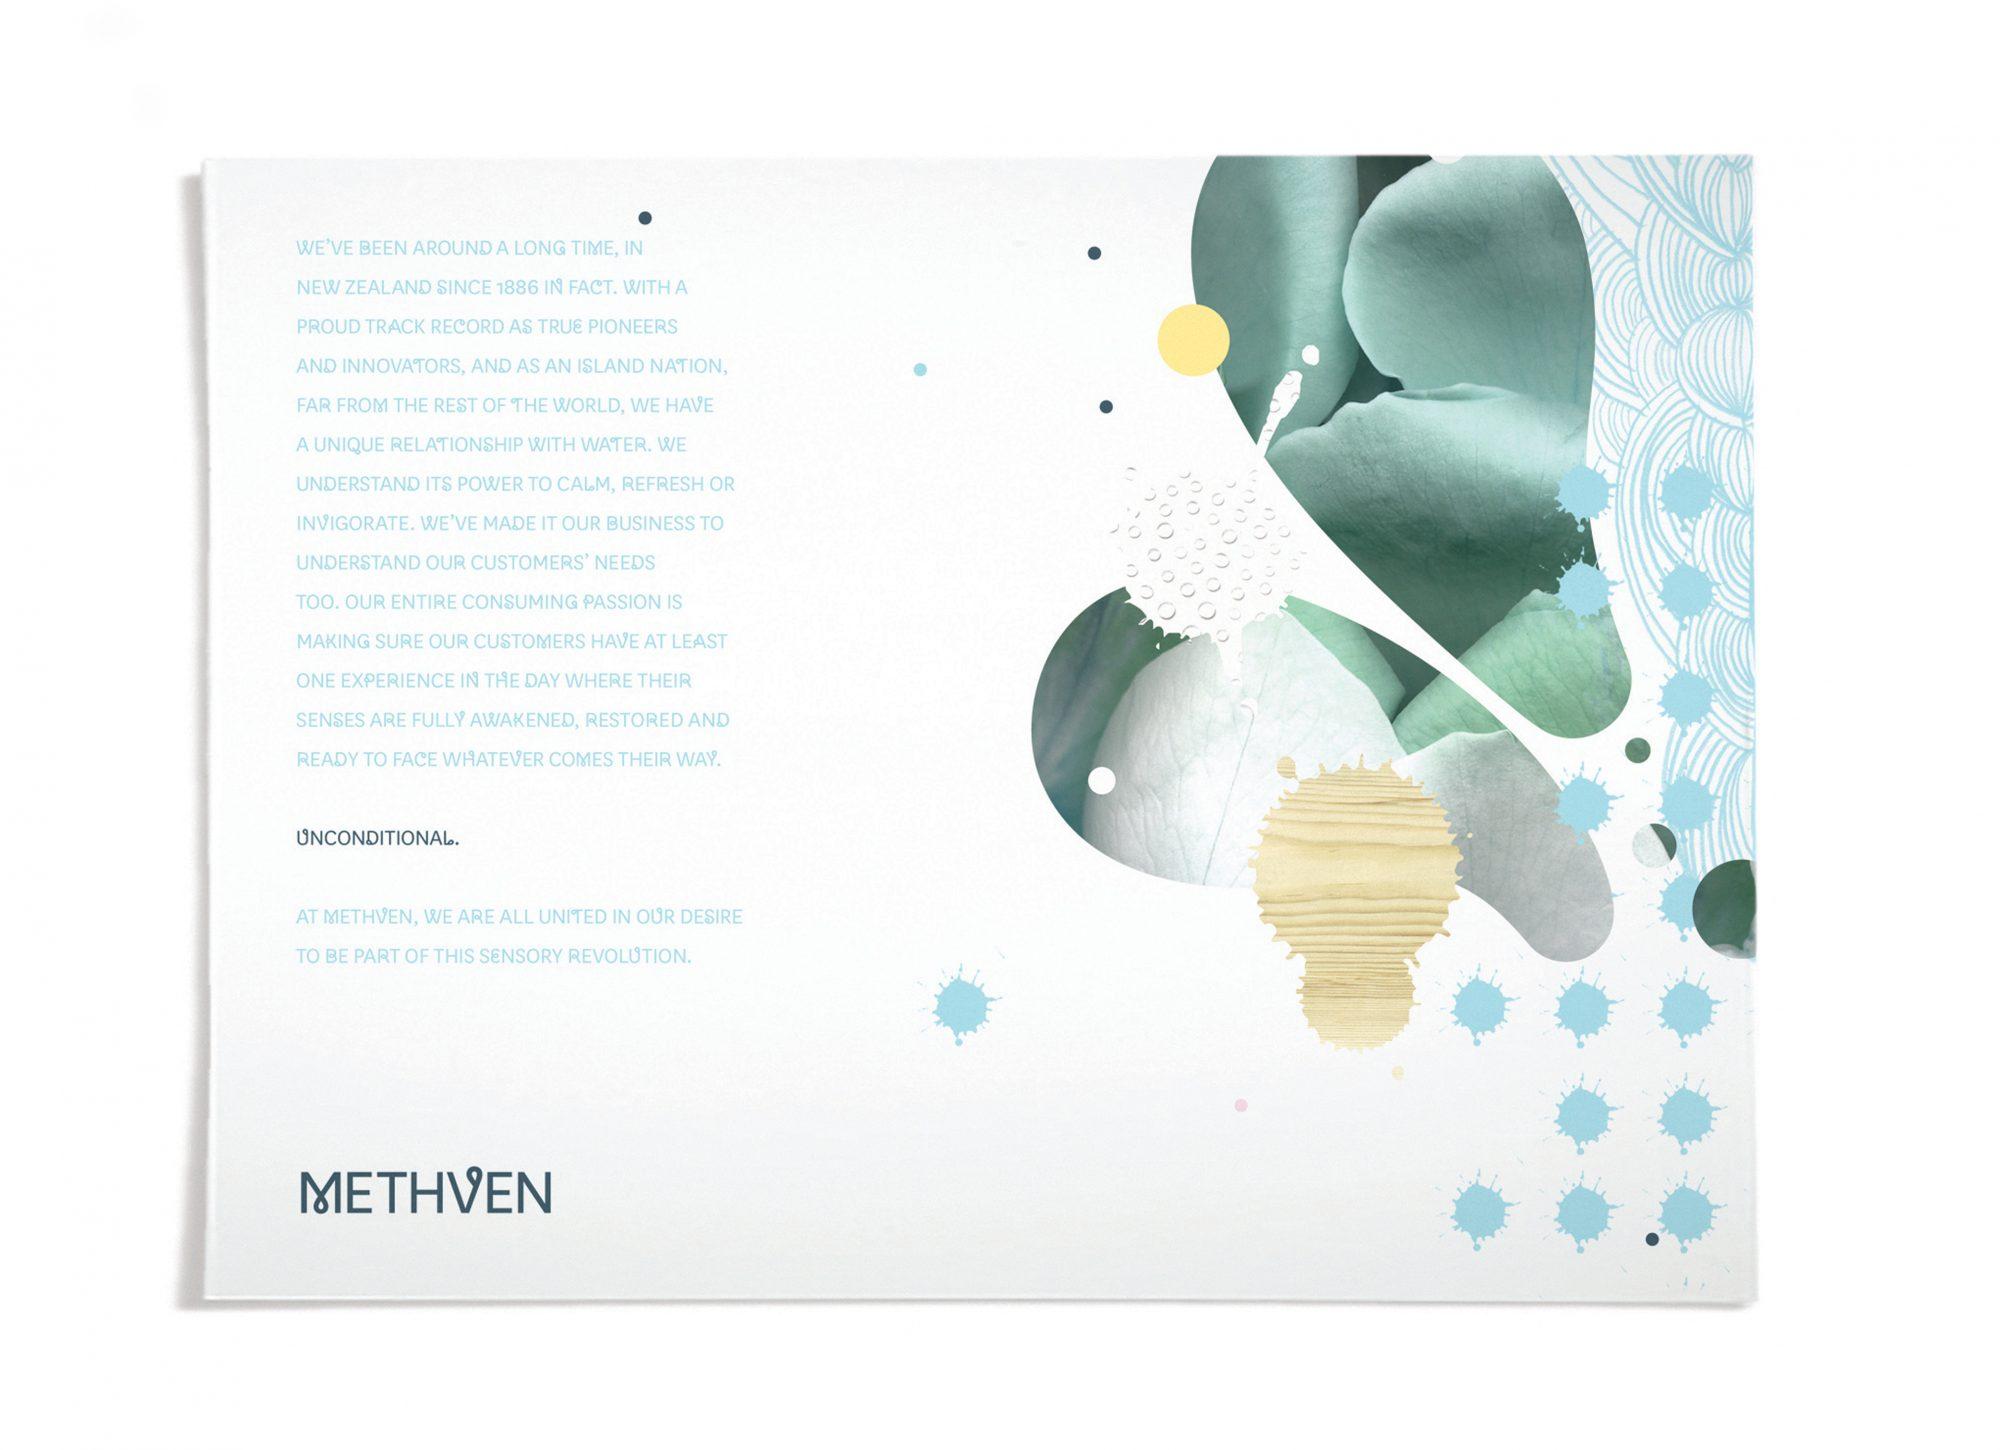 https://tanamitchell.com/wp-content/uploads/2018/10/Methven-2000x1450px7-2000x1450.jpg